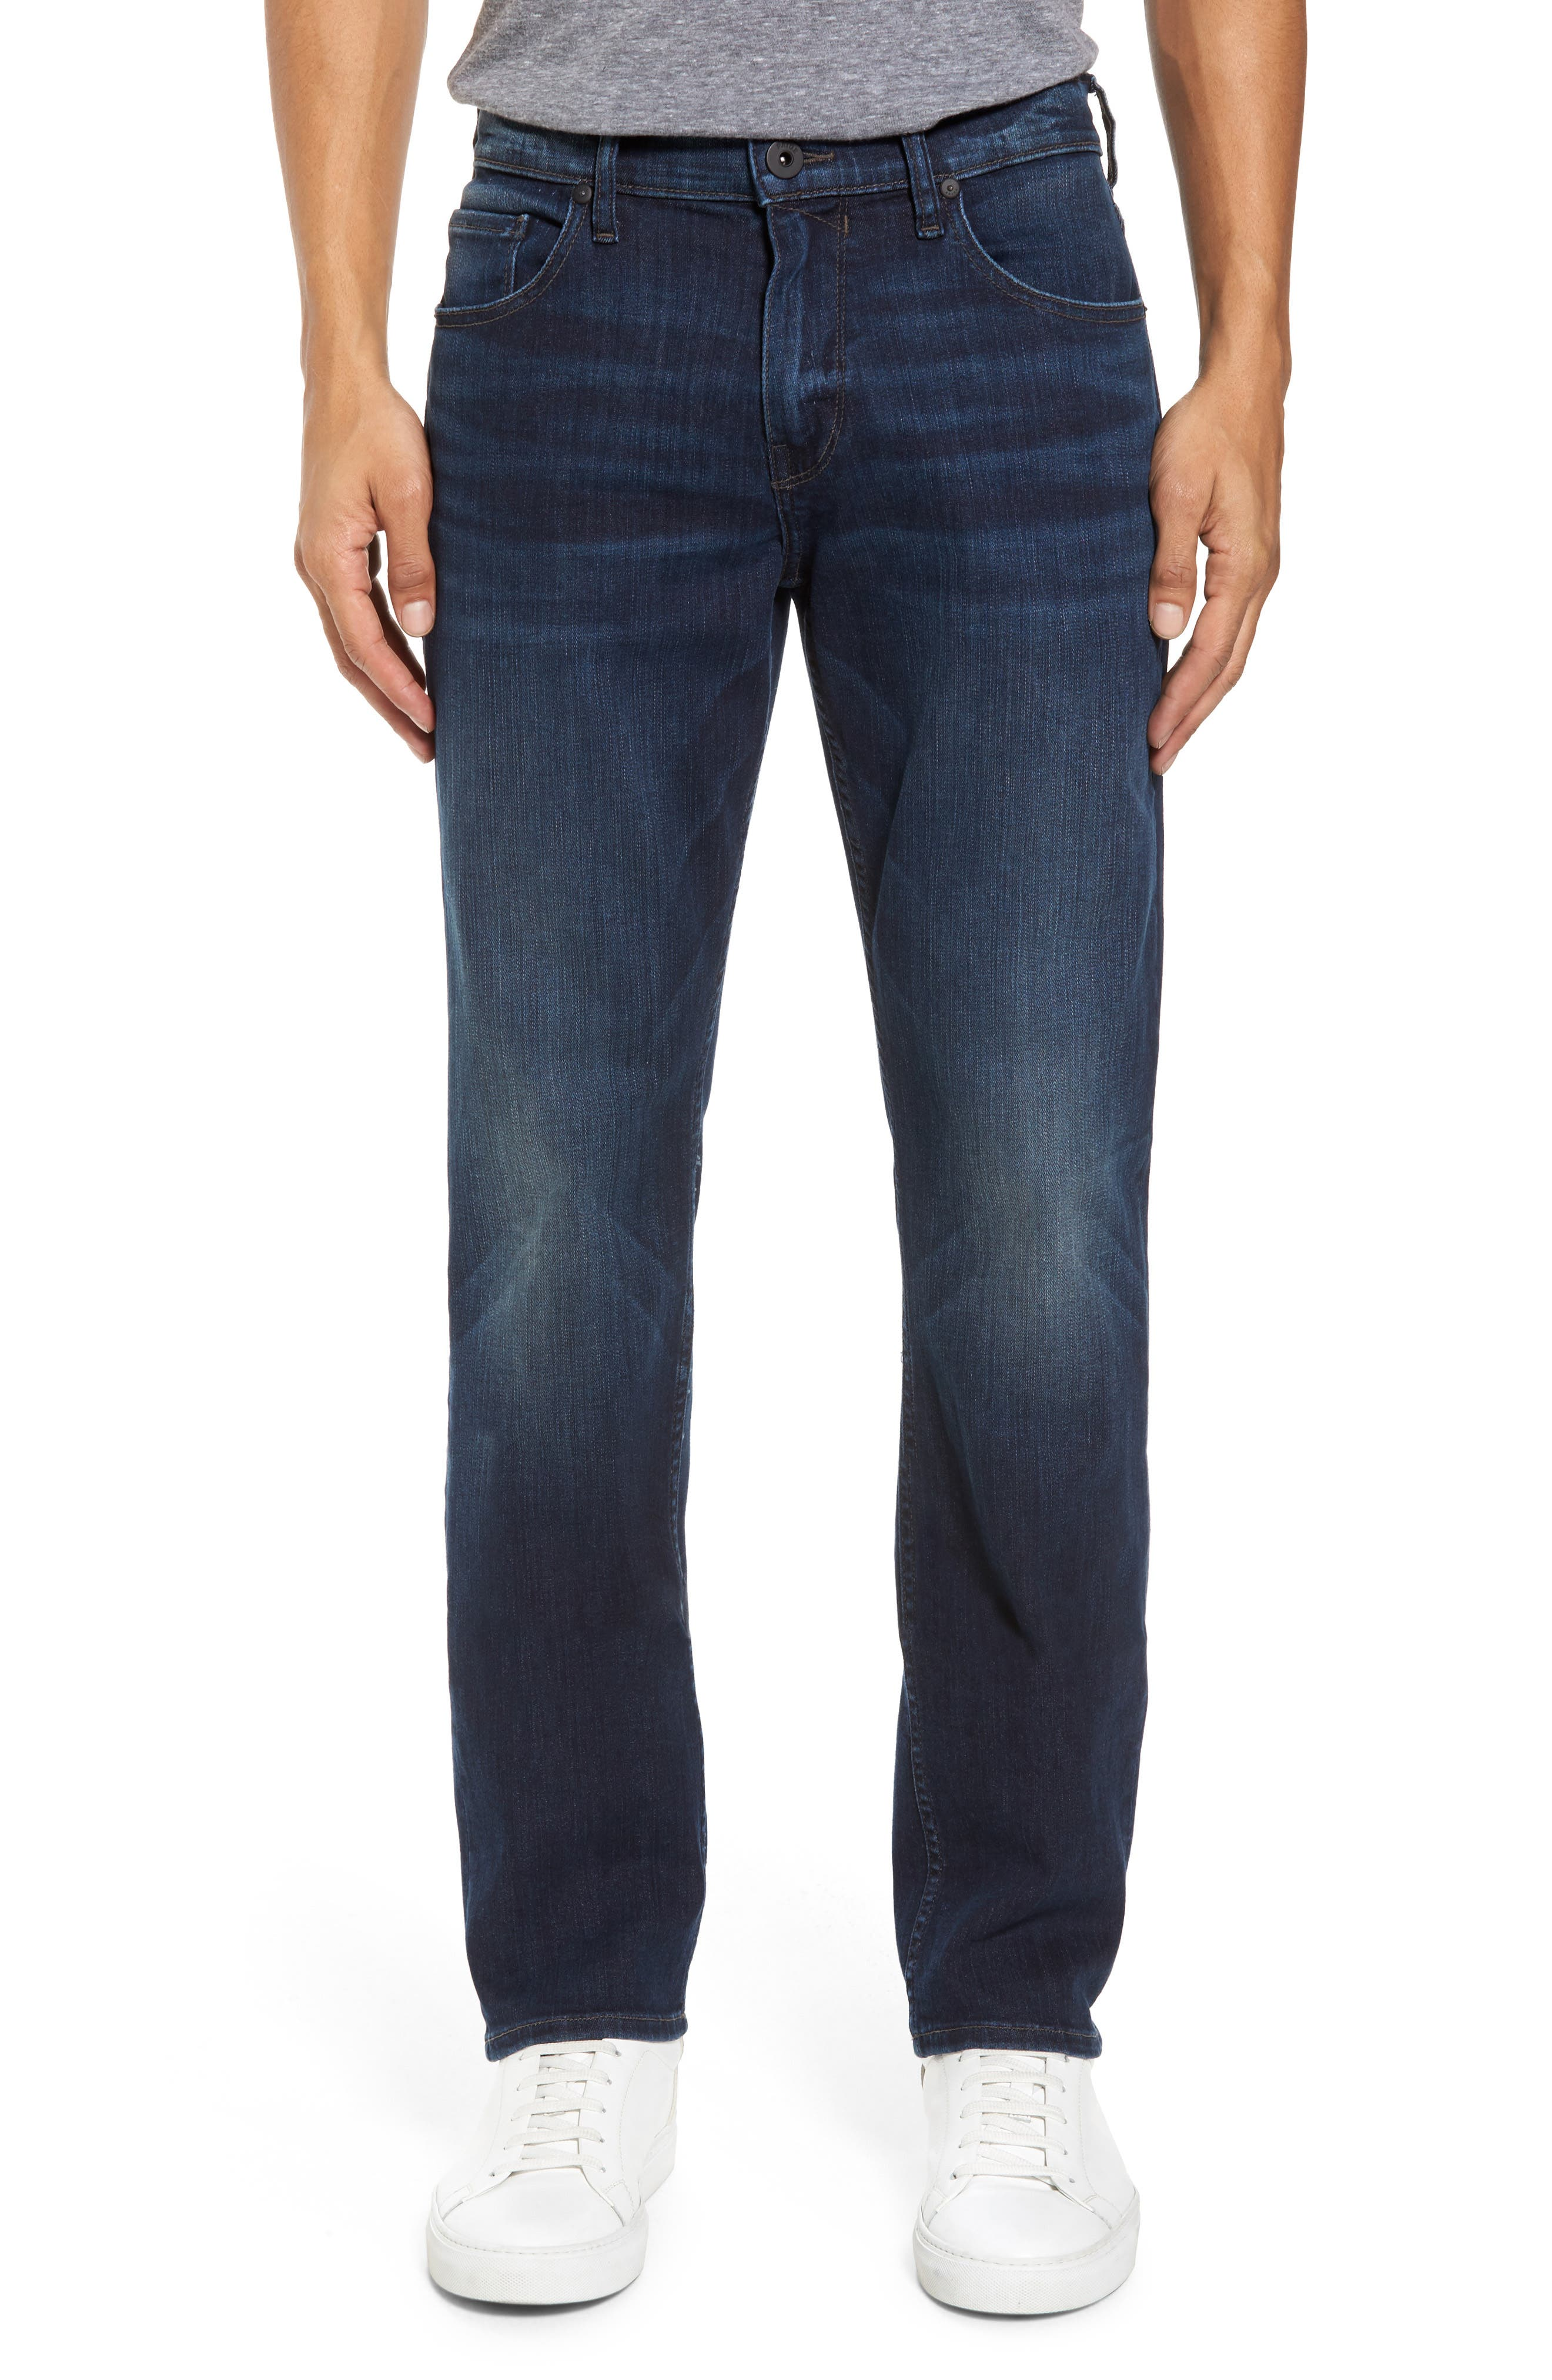 Transcend - Federal Slim Straight Leg Jeans,                         Main,                         color, Graham